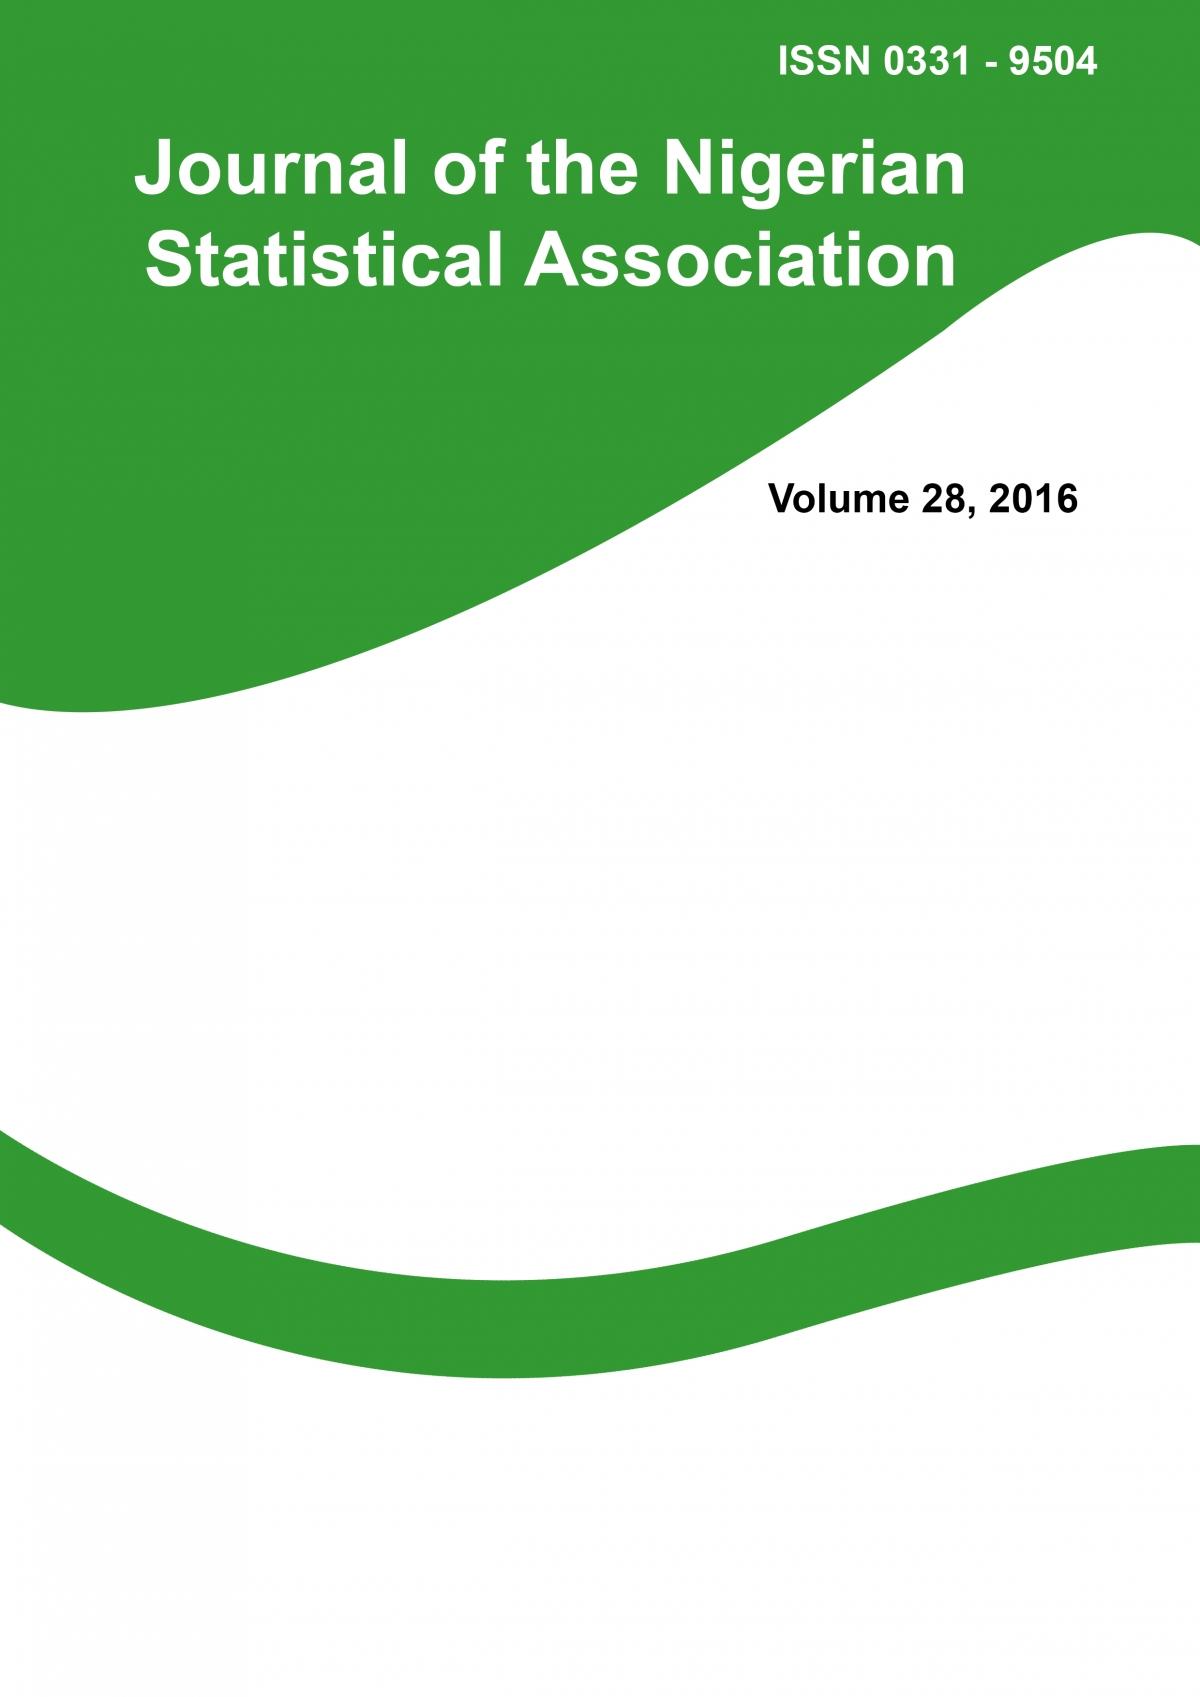 Journal of the Nigerian Statistical Association Vol. 28, 2016